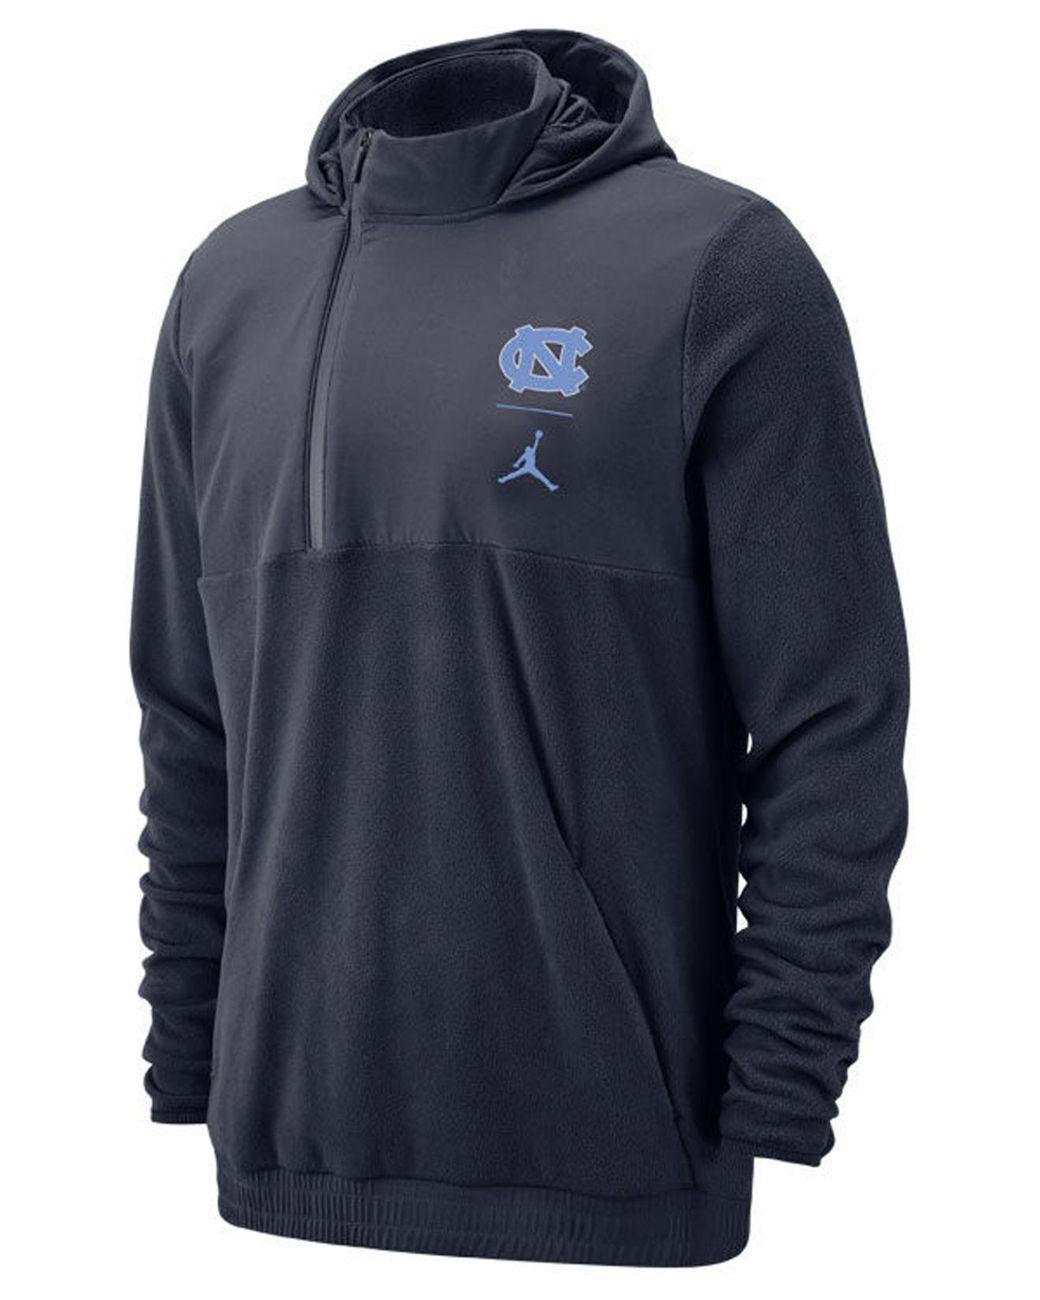 4d8989b81ec5 Lyst - Nike North Carolina Tar Heels Therma Sphere Max Jacket in ...